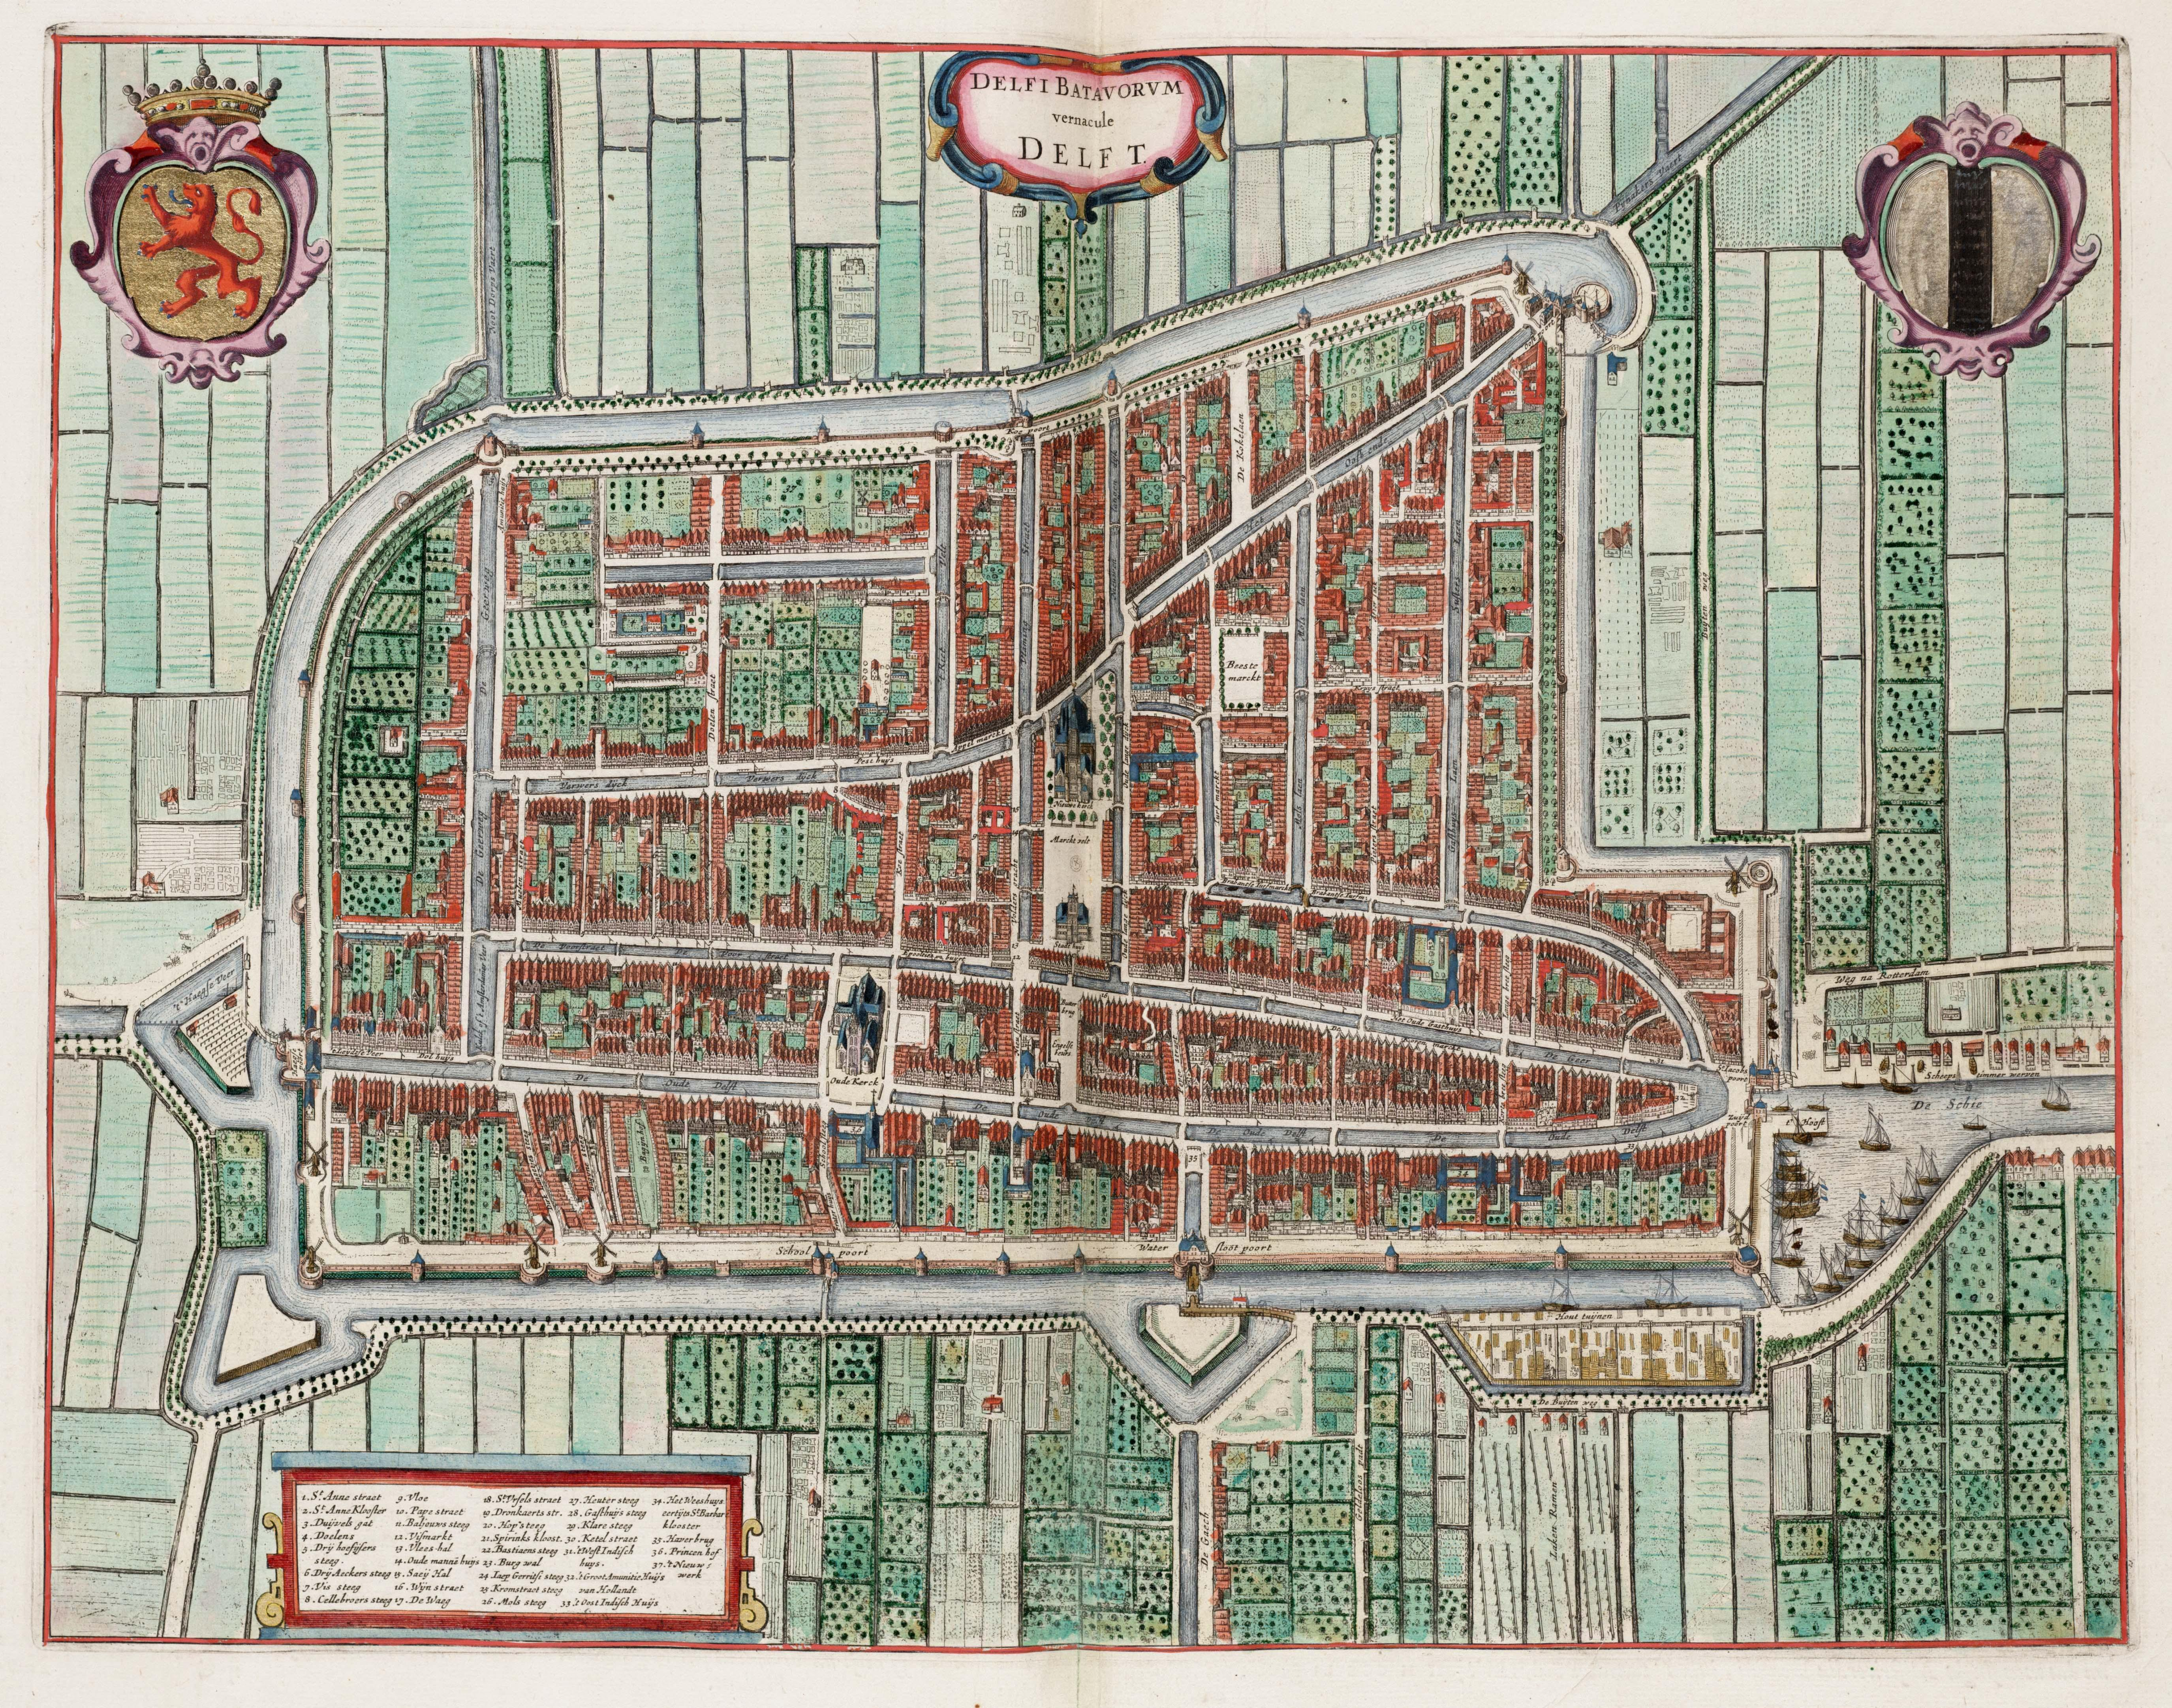 File:Delft - Delfi Batavorum vernacule Delft (1649).jpg